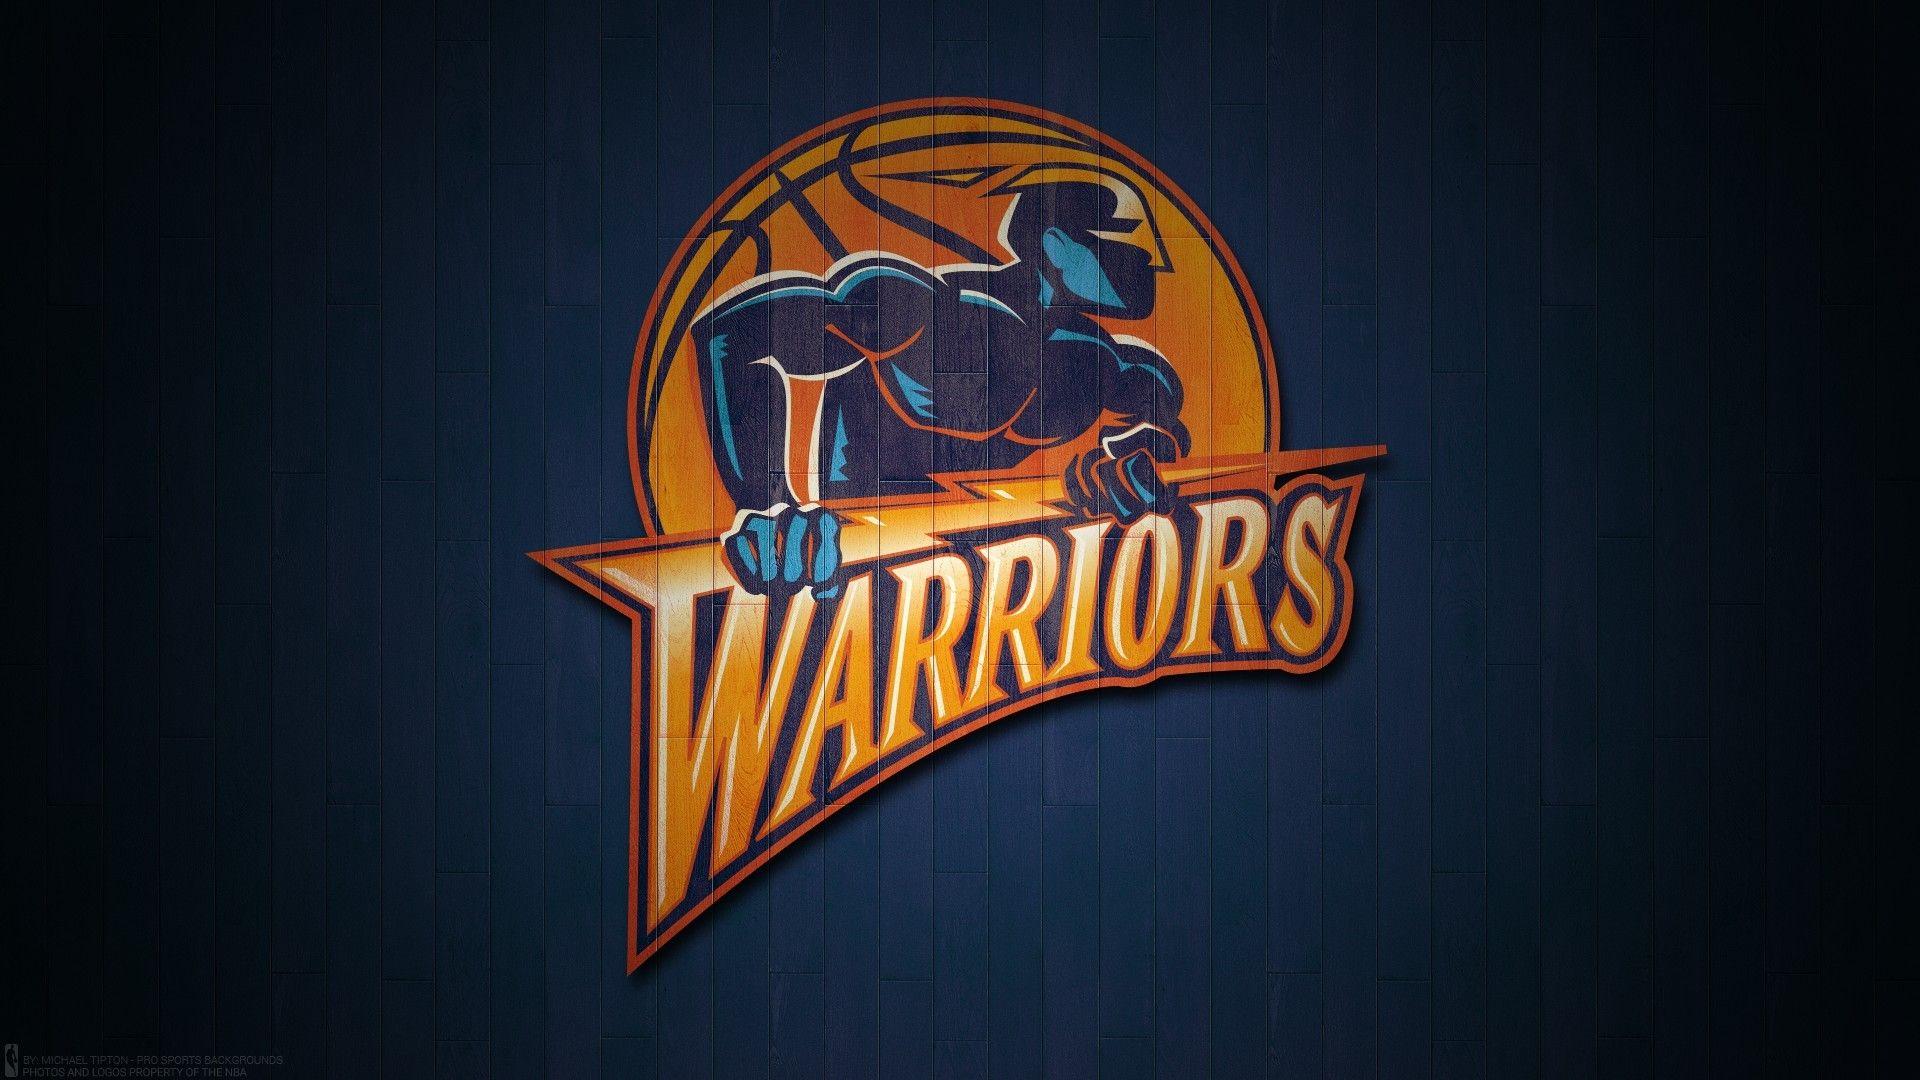 Backgrounds Golden State Warriors Hd 2021 Basketball Wallpaper Golden State Warriors Wallpaper Warriors Wallpaper Golden State Warriors